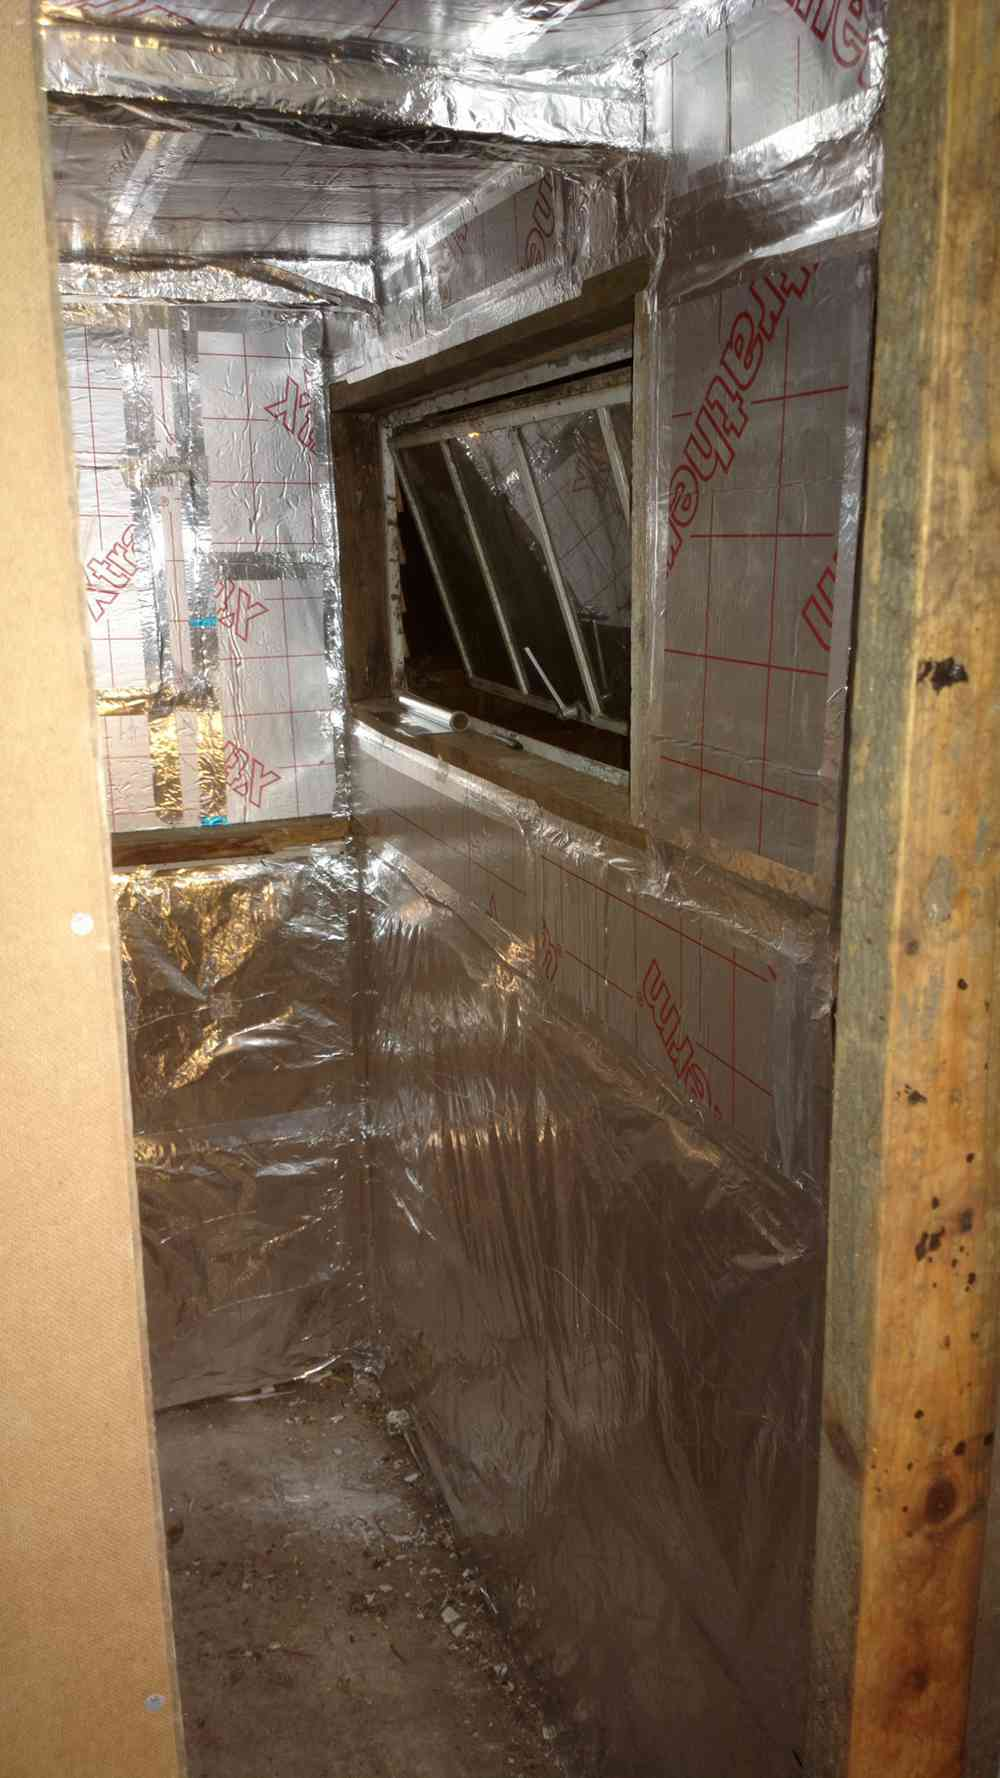 19. DIY Electrically Heated Sauna